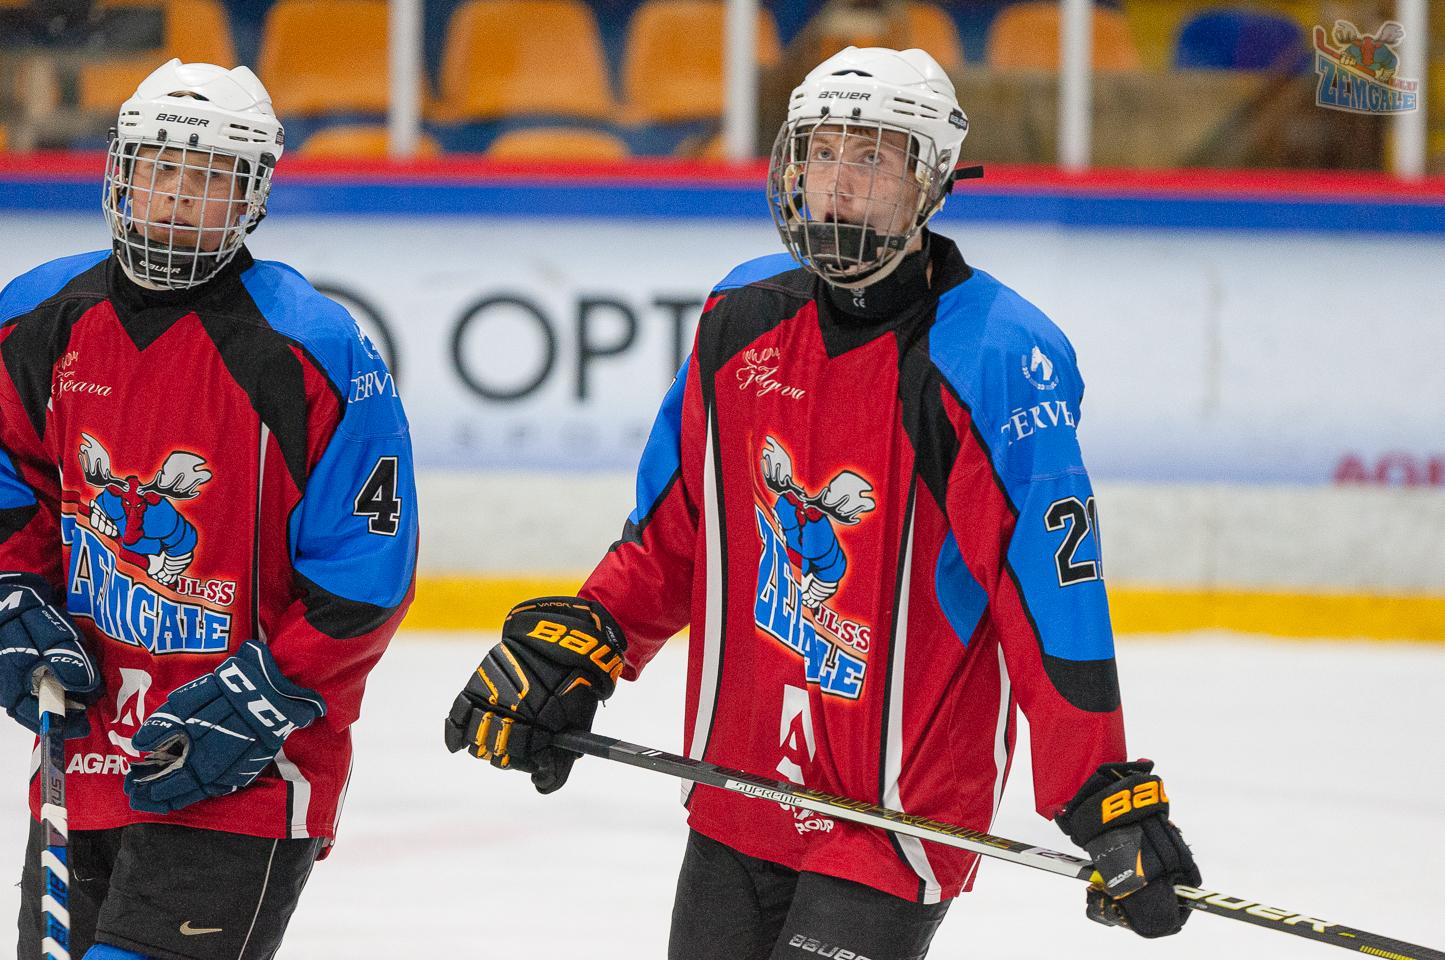 Jelgavas hokeja skola JLSS U17 - Venta 2002 14092019-20